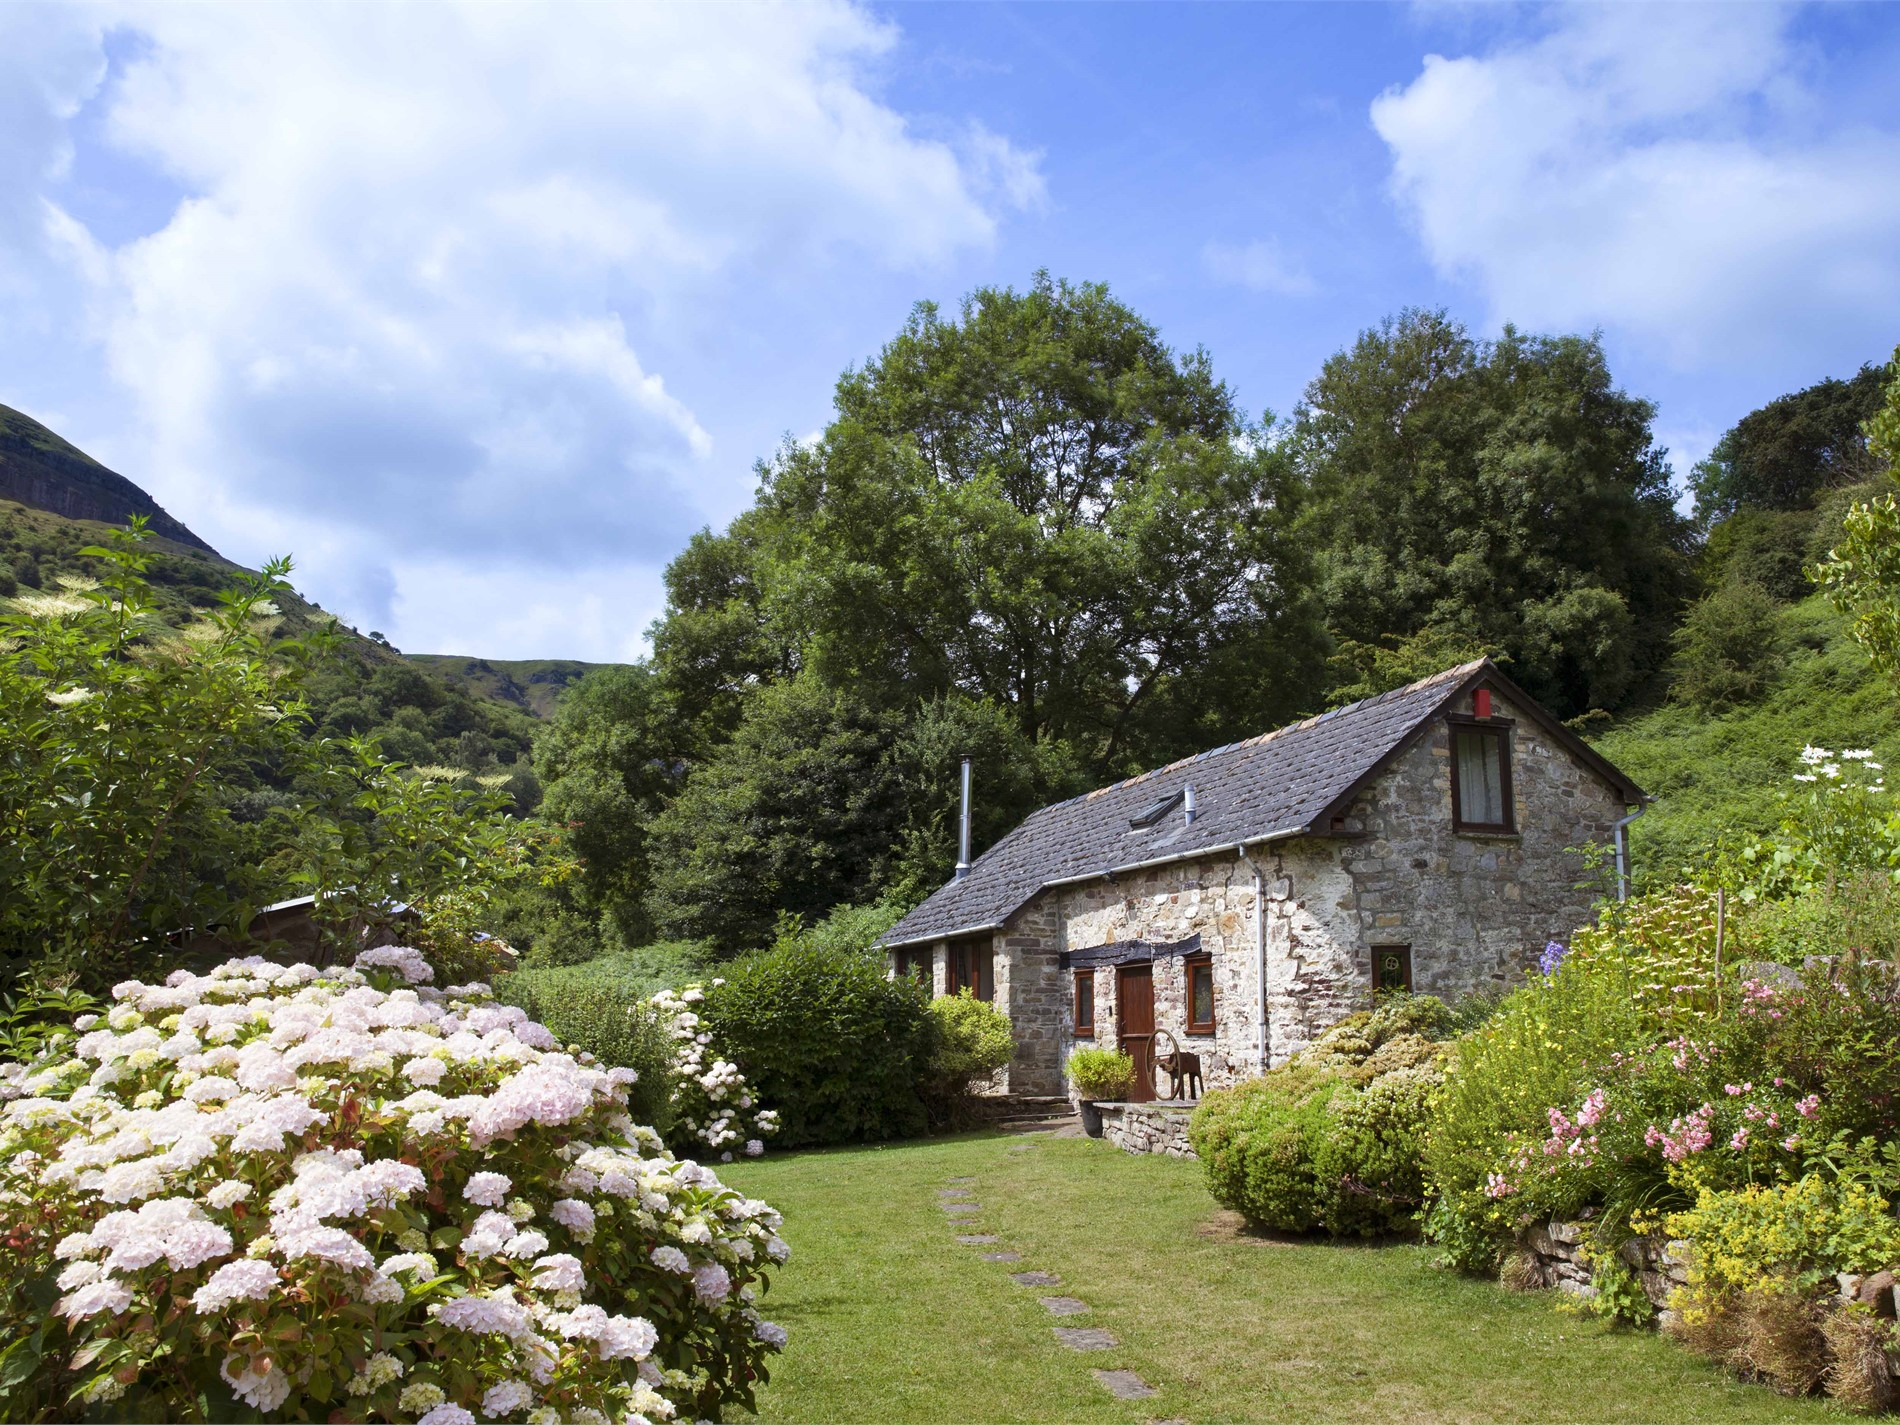 1 Bedroom Cottage in Crickhowell, Mid Wales